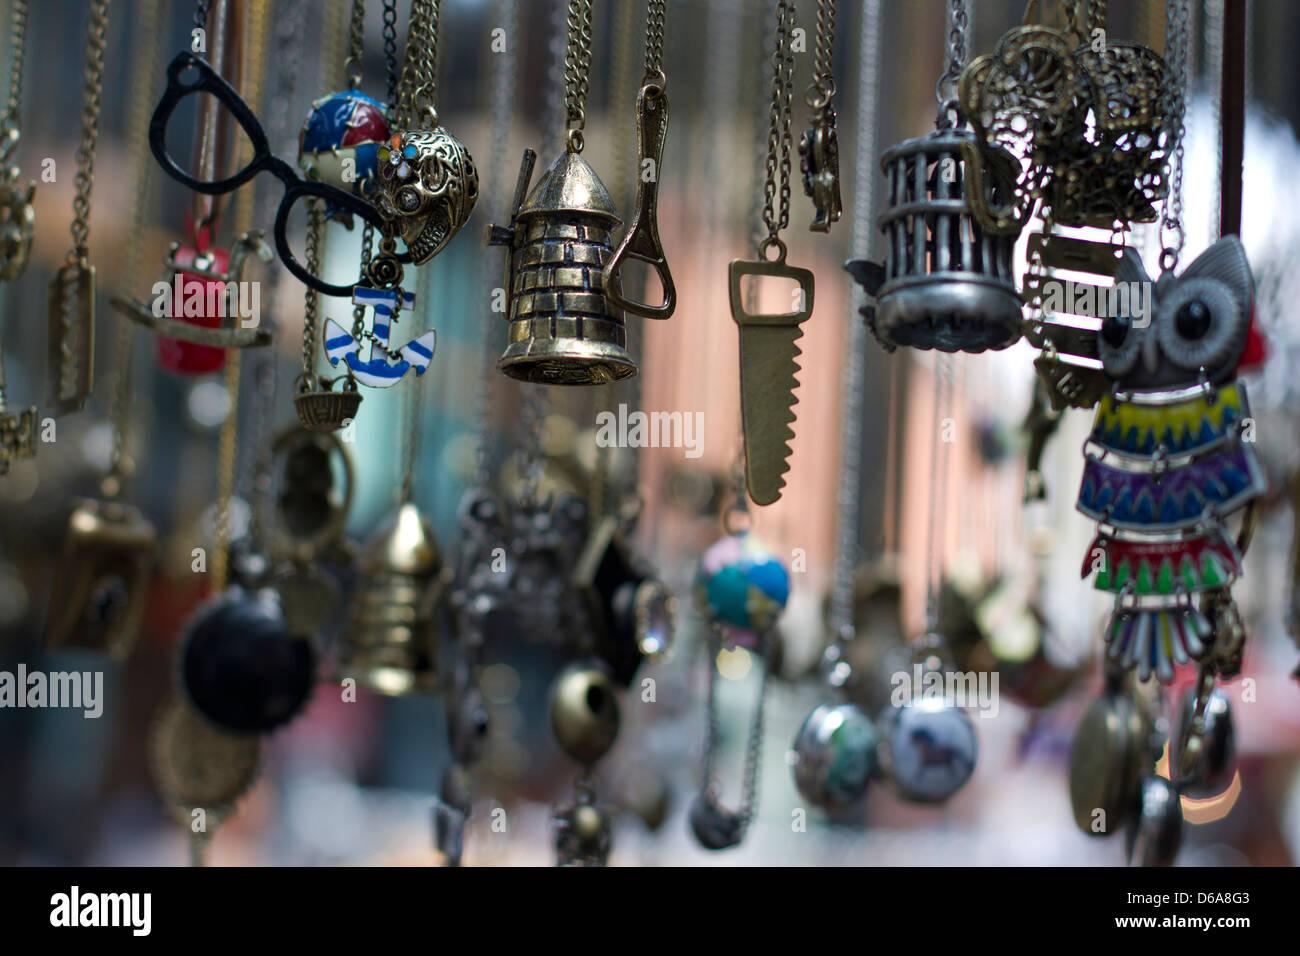 Costume Jewelry - Stock Image